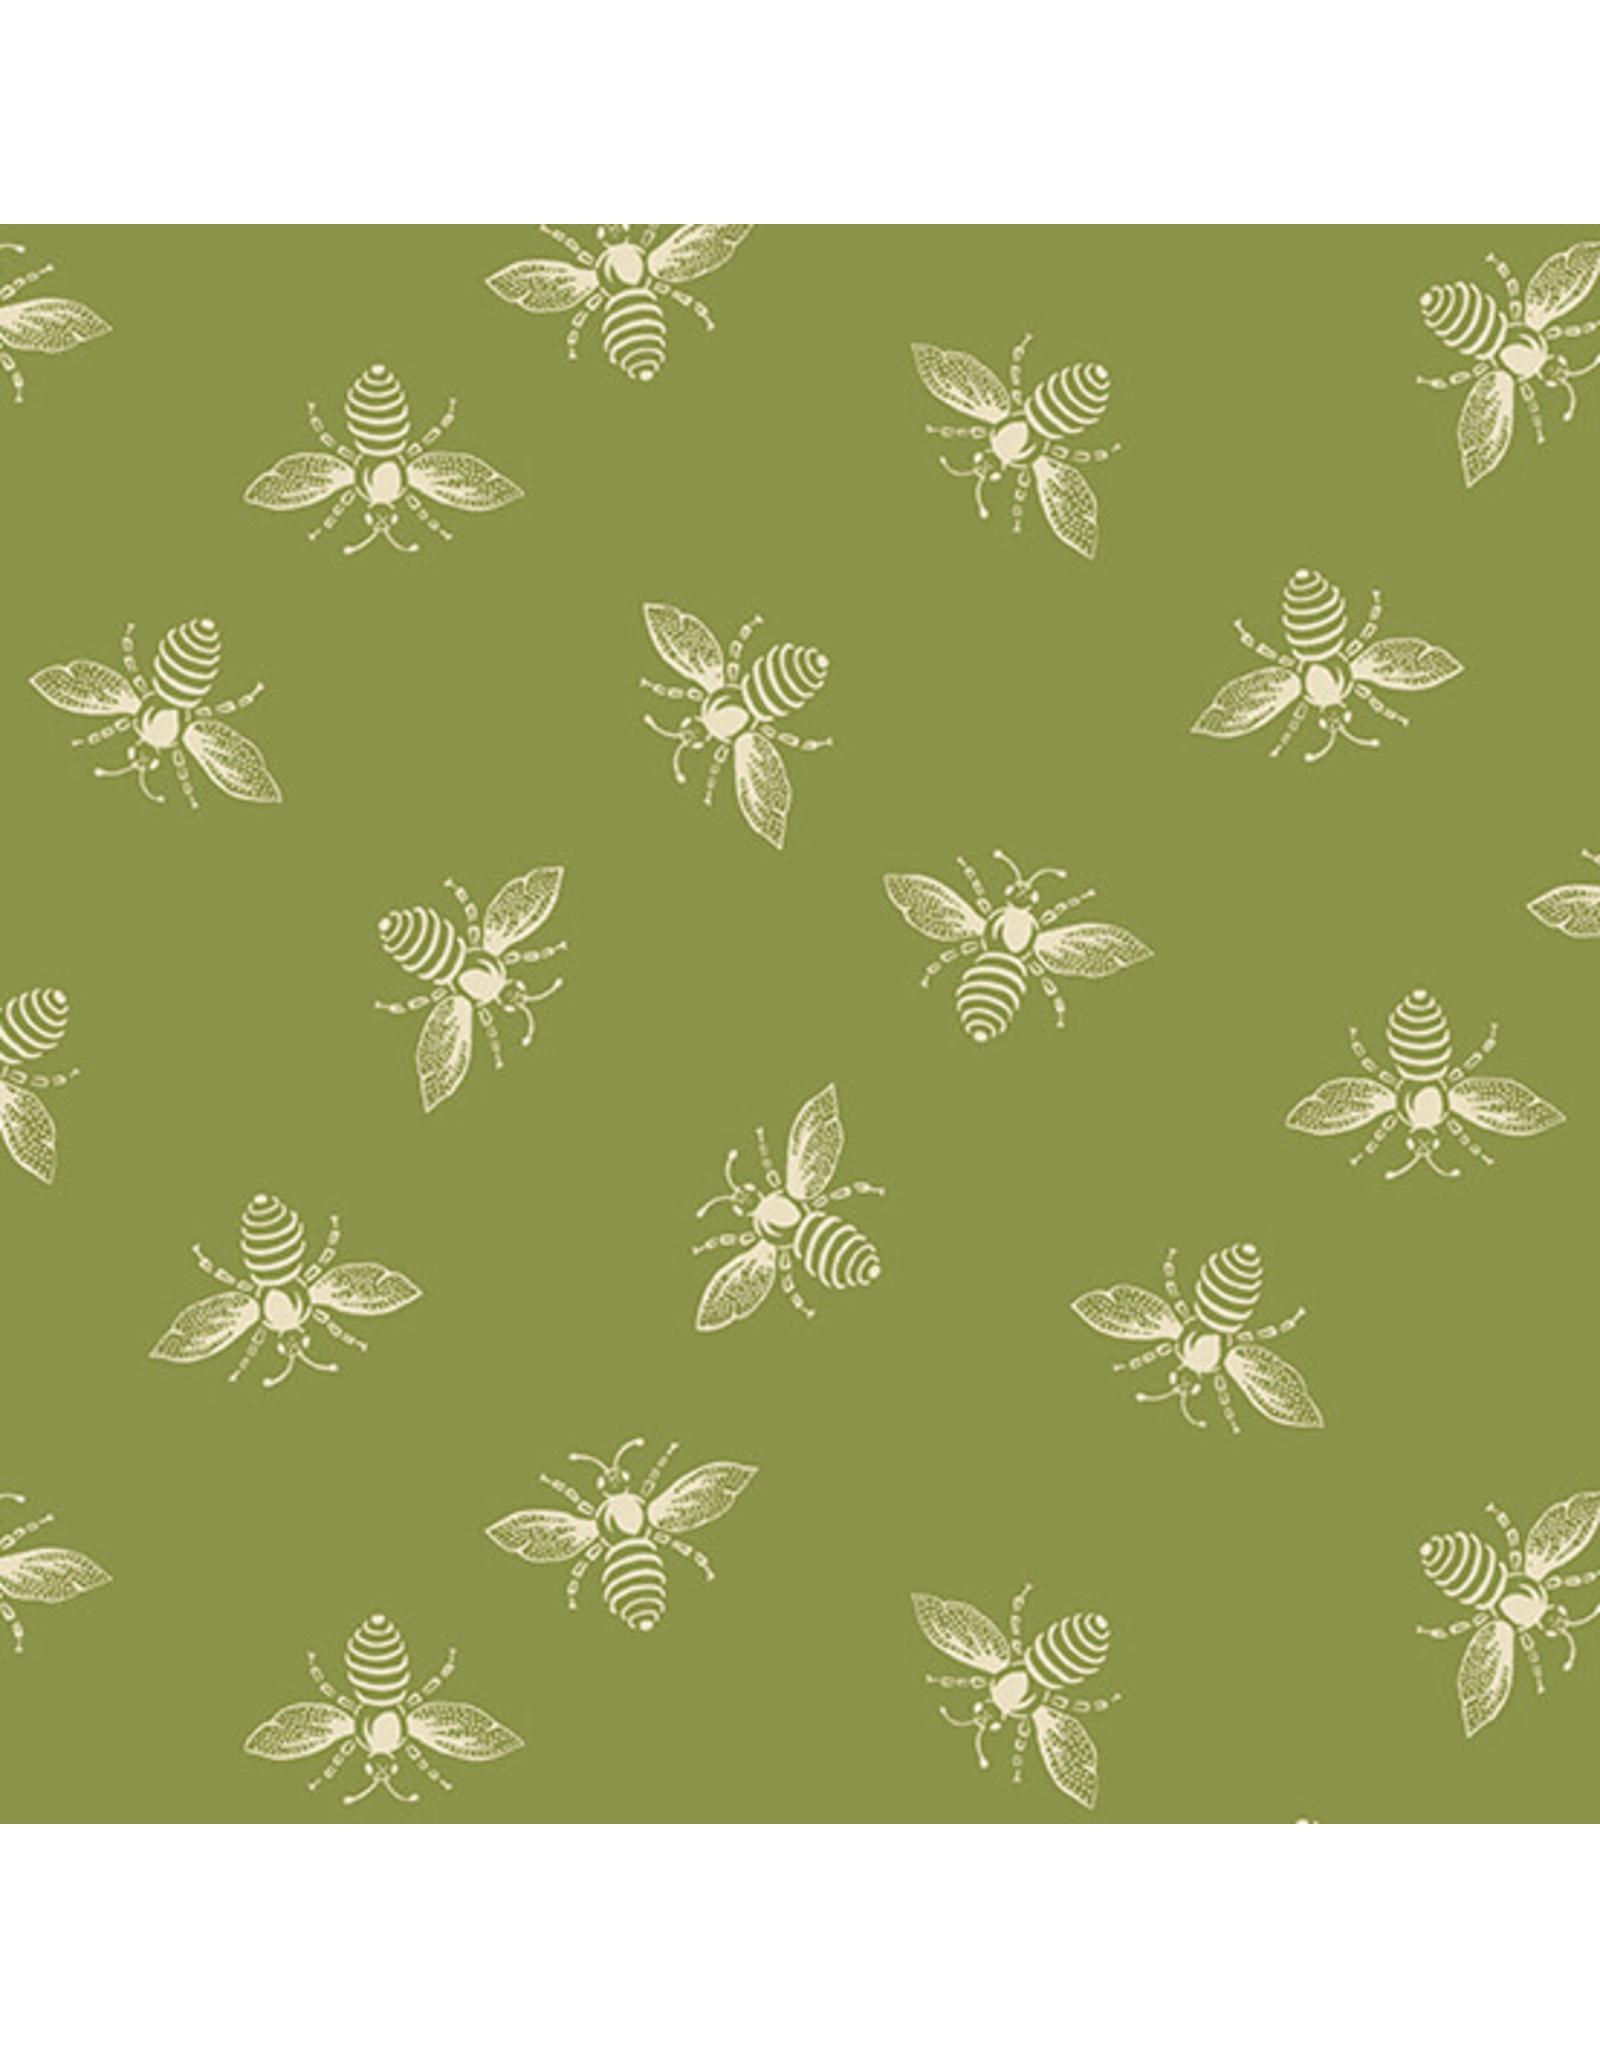 Renee Nanneman French Bee in Olivette, Fabric Half-Yards